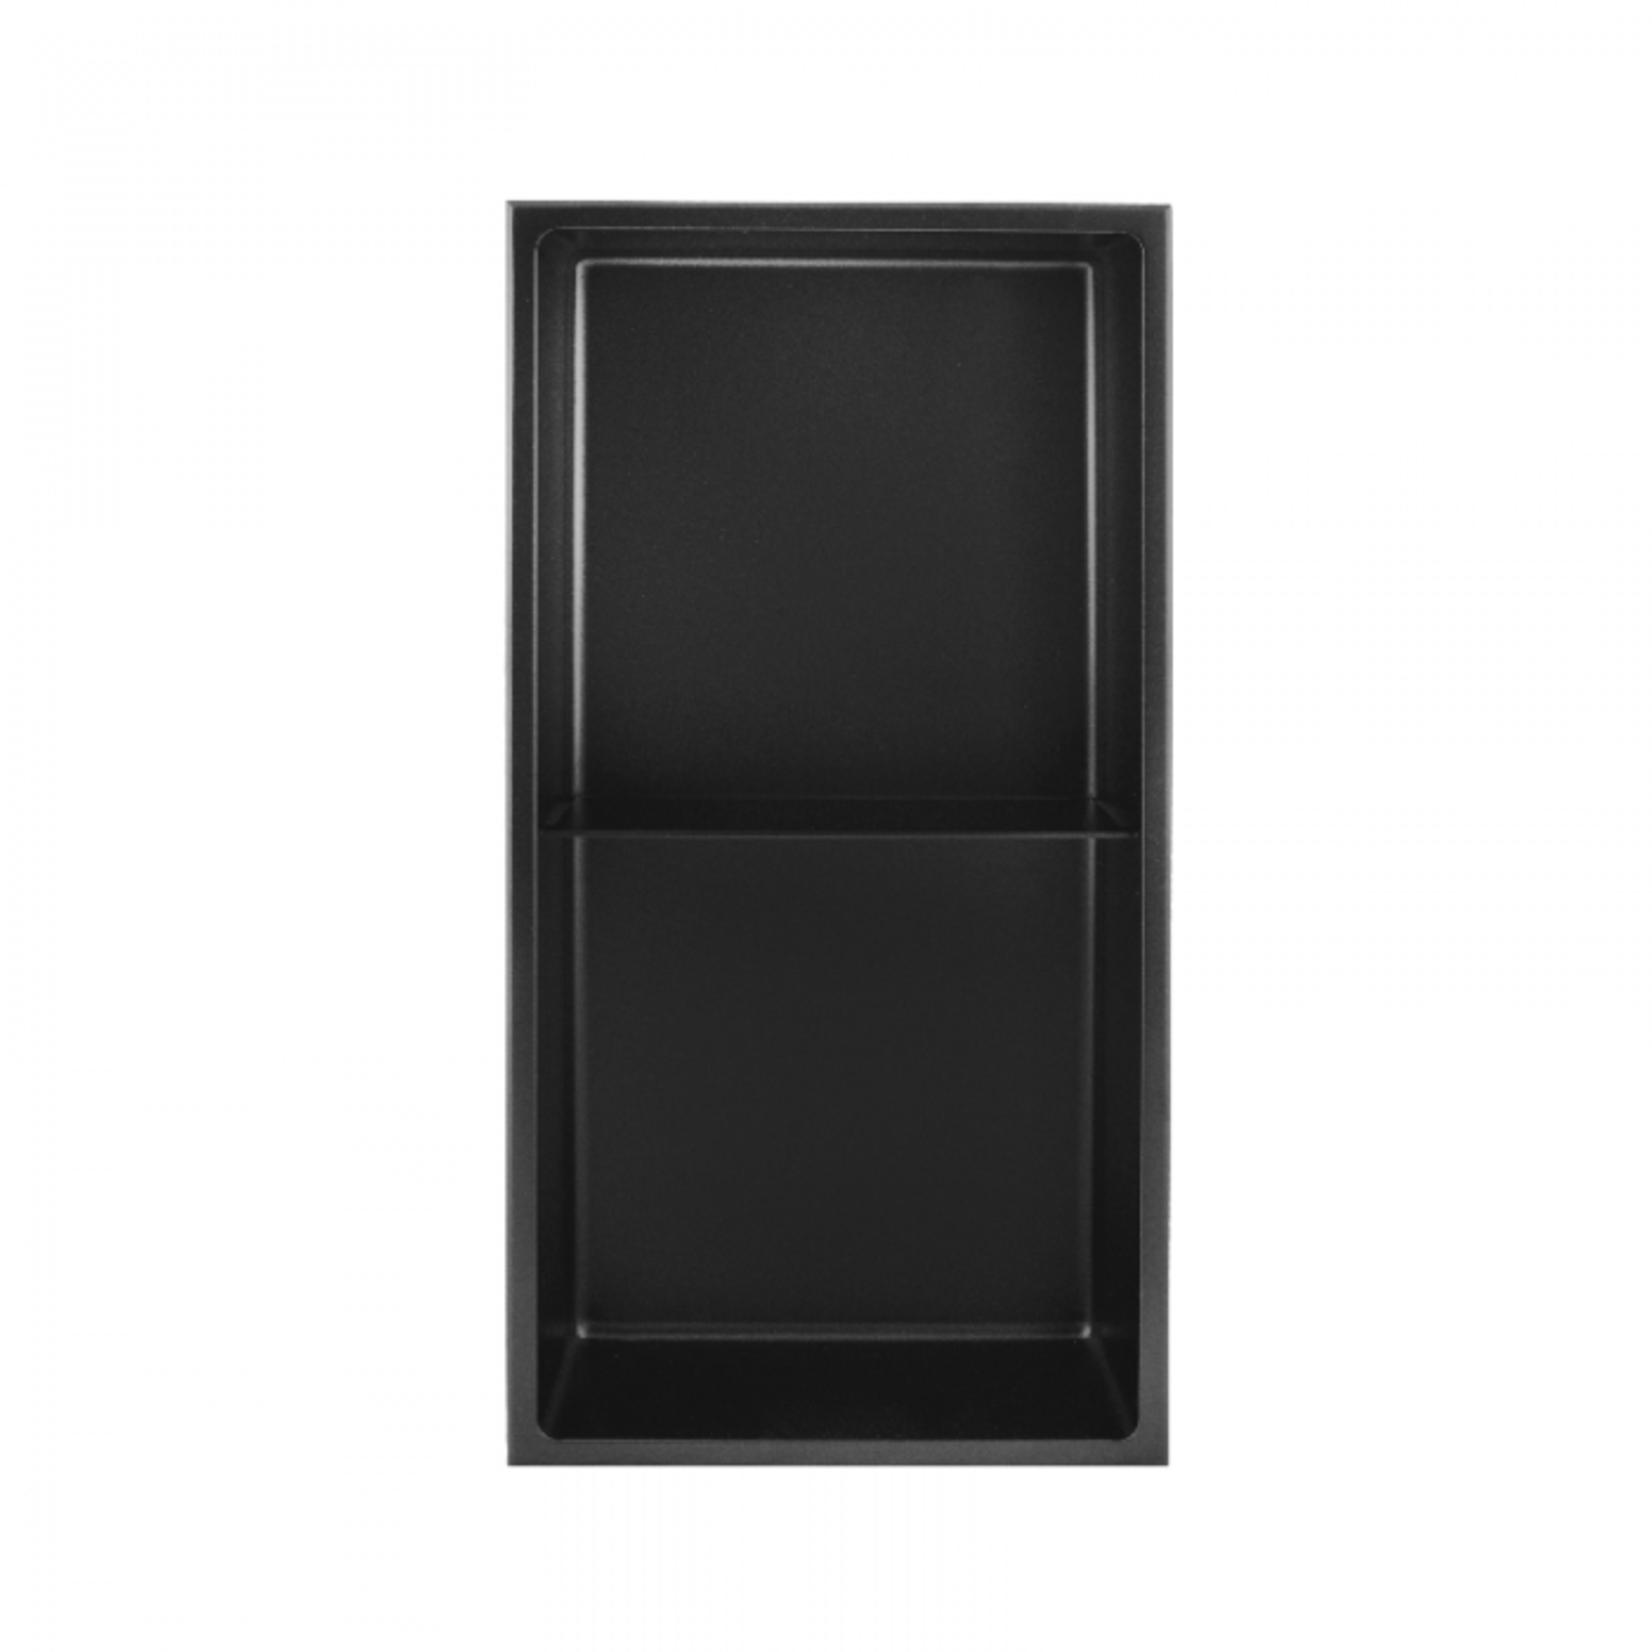 Wall niche with shelf 24x12 Black Nautika NI2412TB